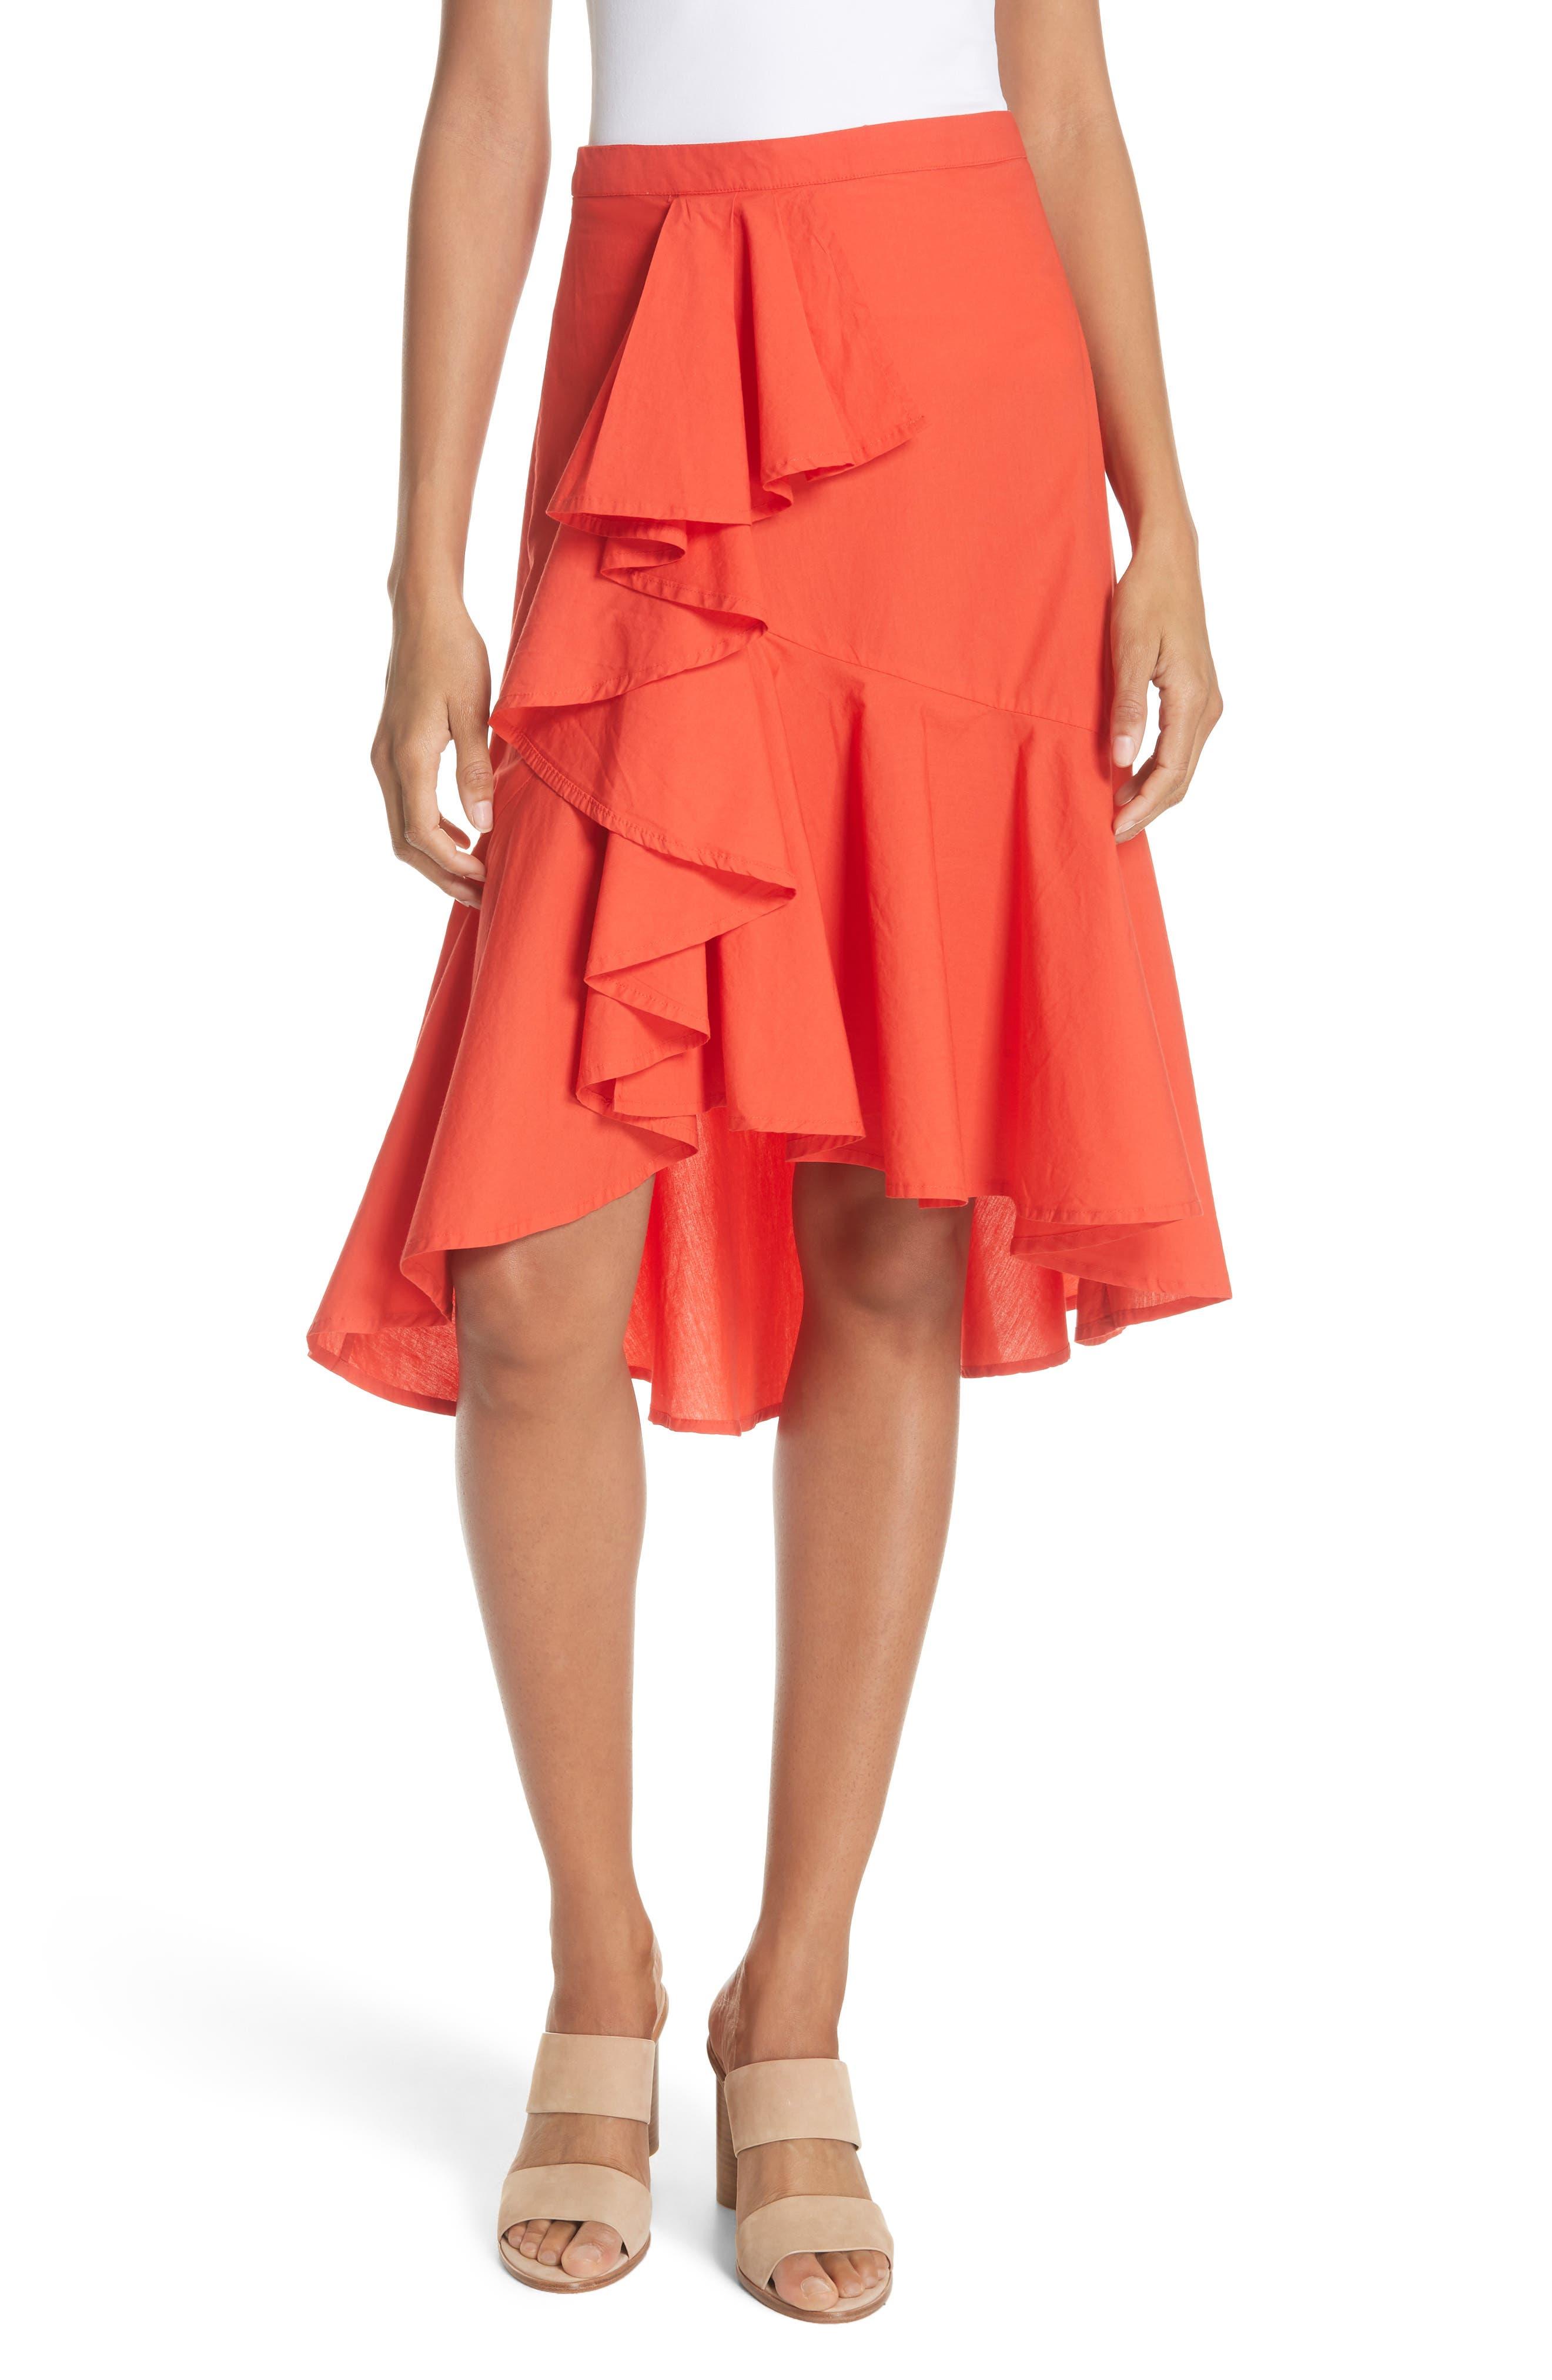 Chesmu Ruffled Cotton Skirt,                         Main,                         color, Salsa